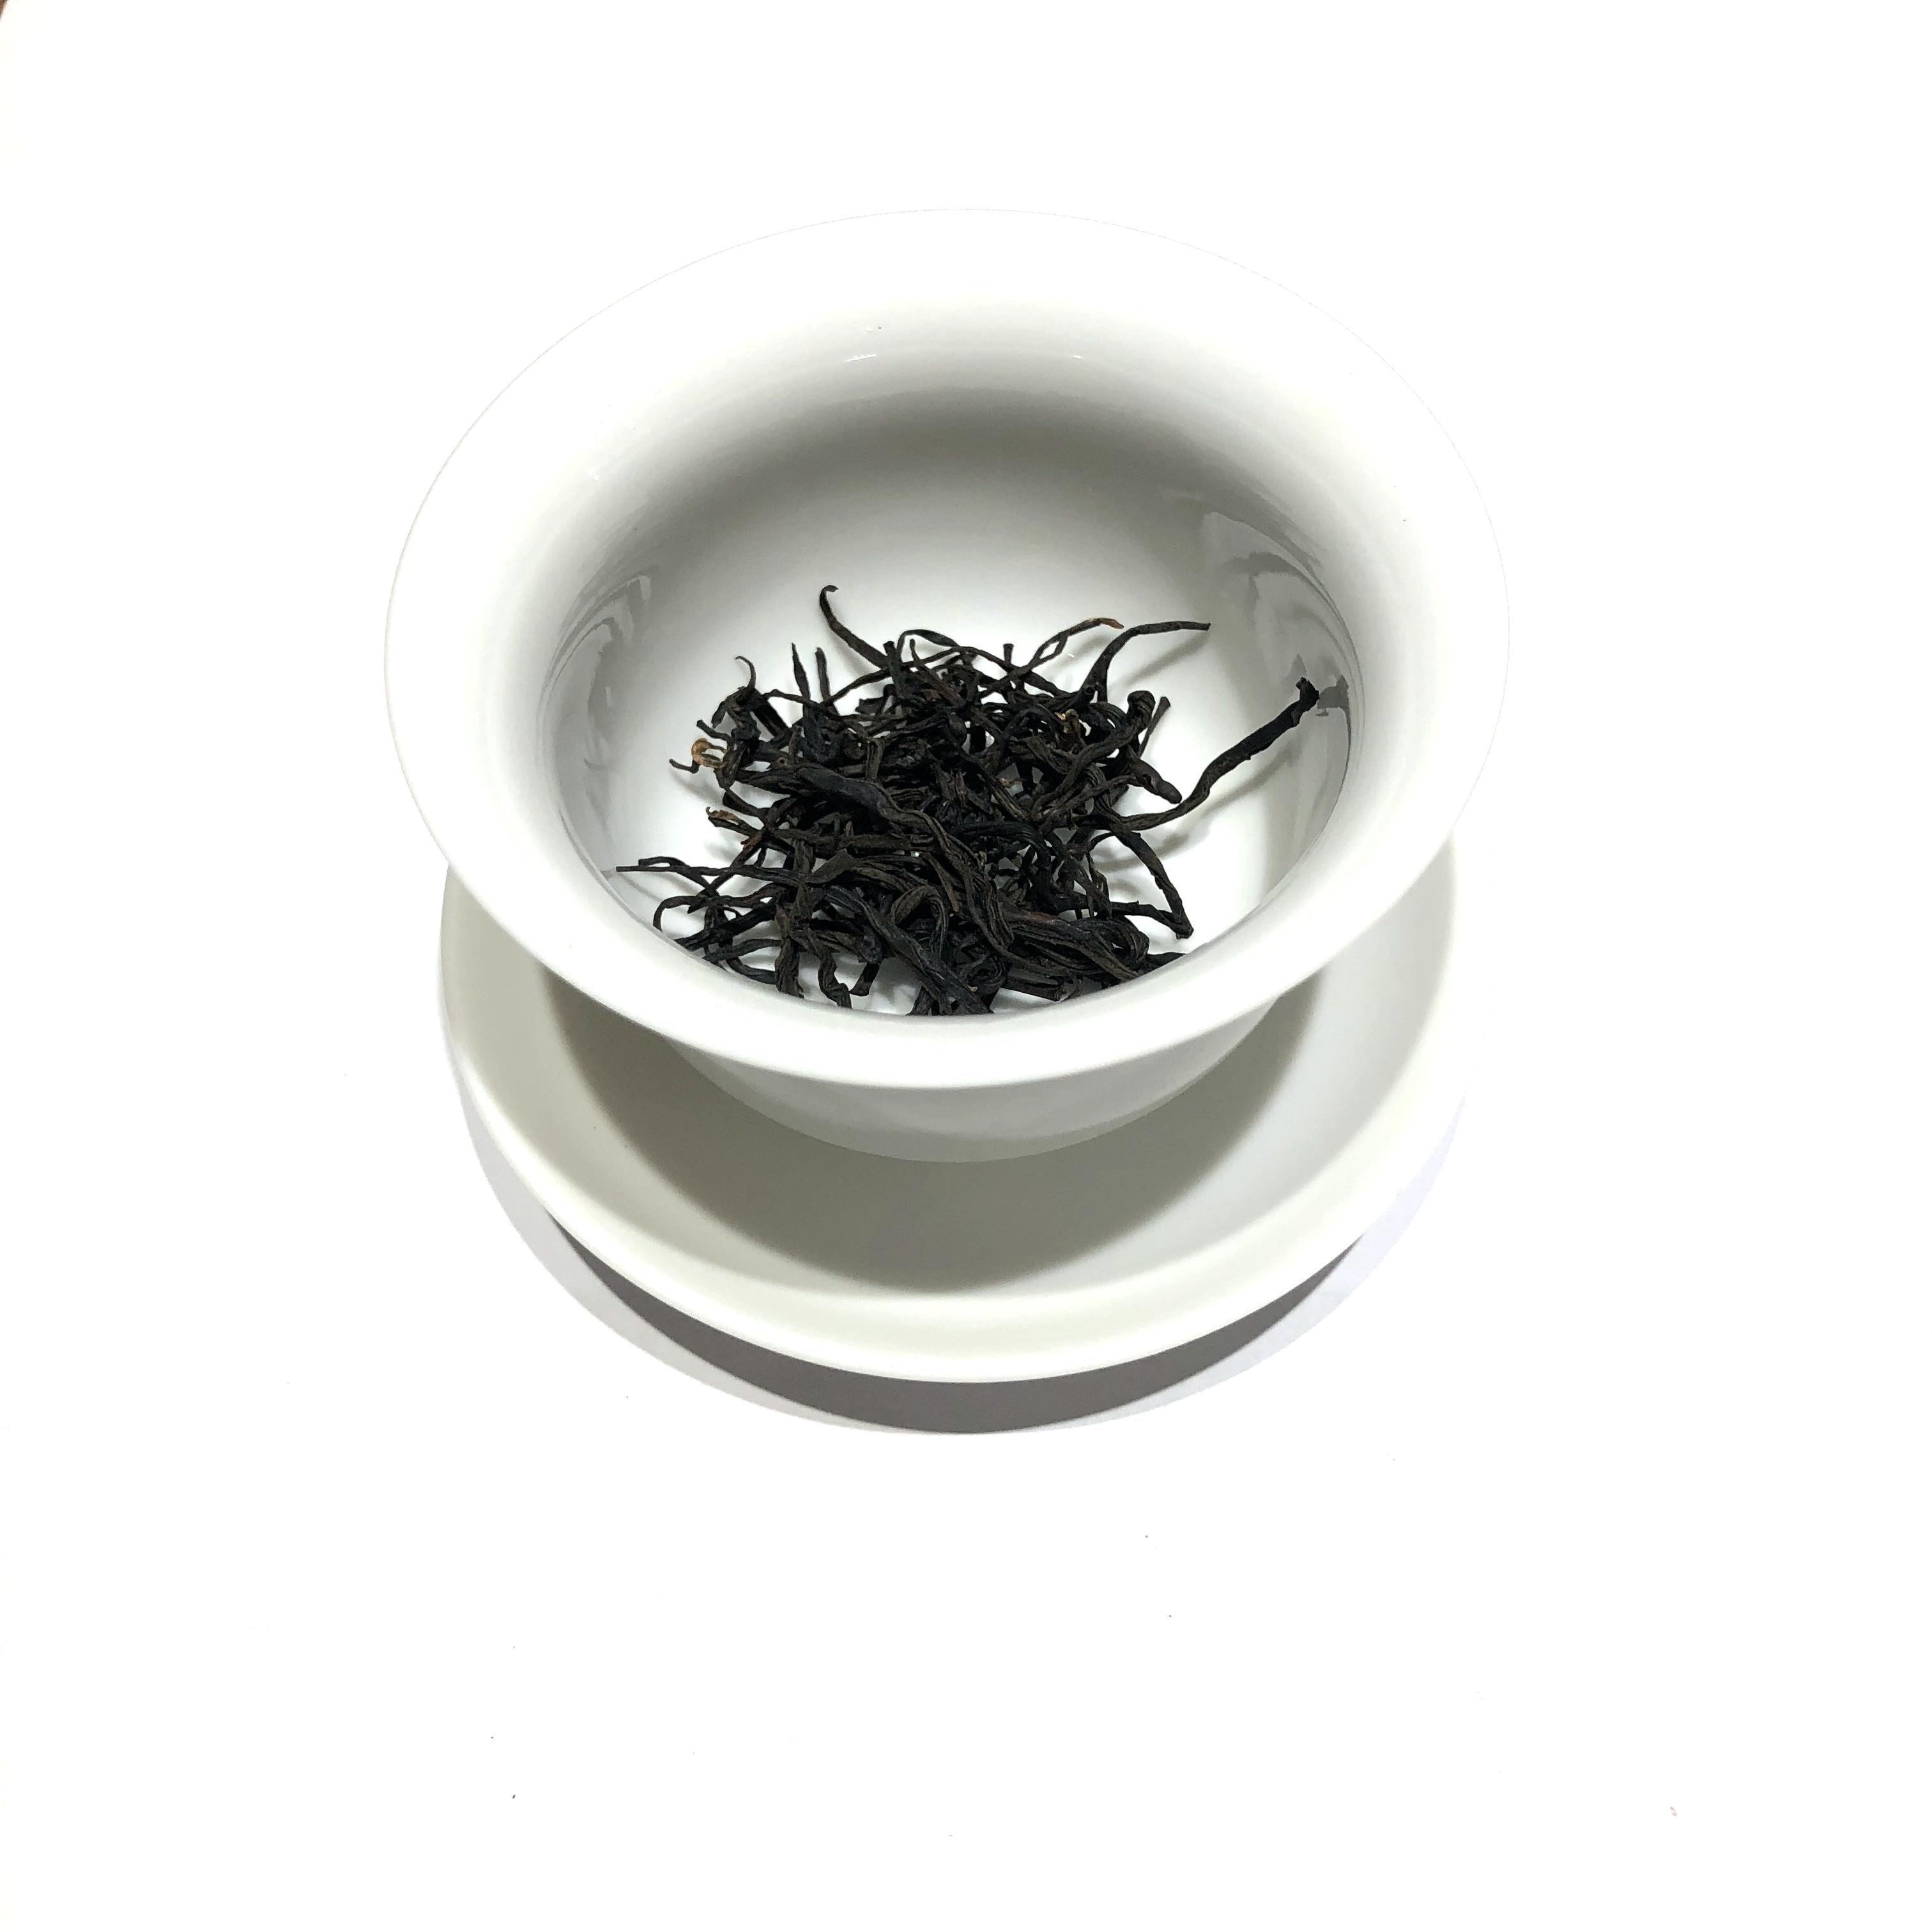 Chinese black tea bulk is made of fresh tea leaves - 4uTea | 4uTea.com